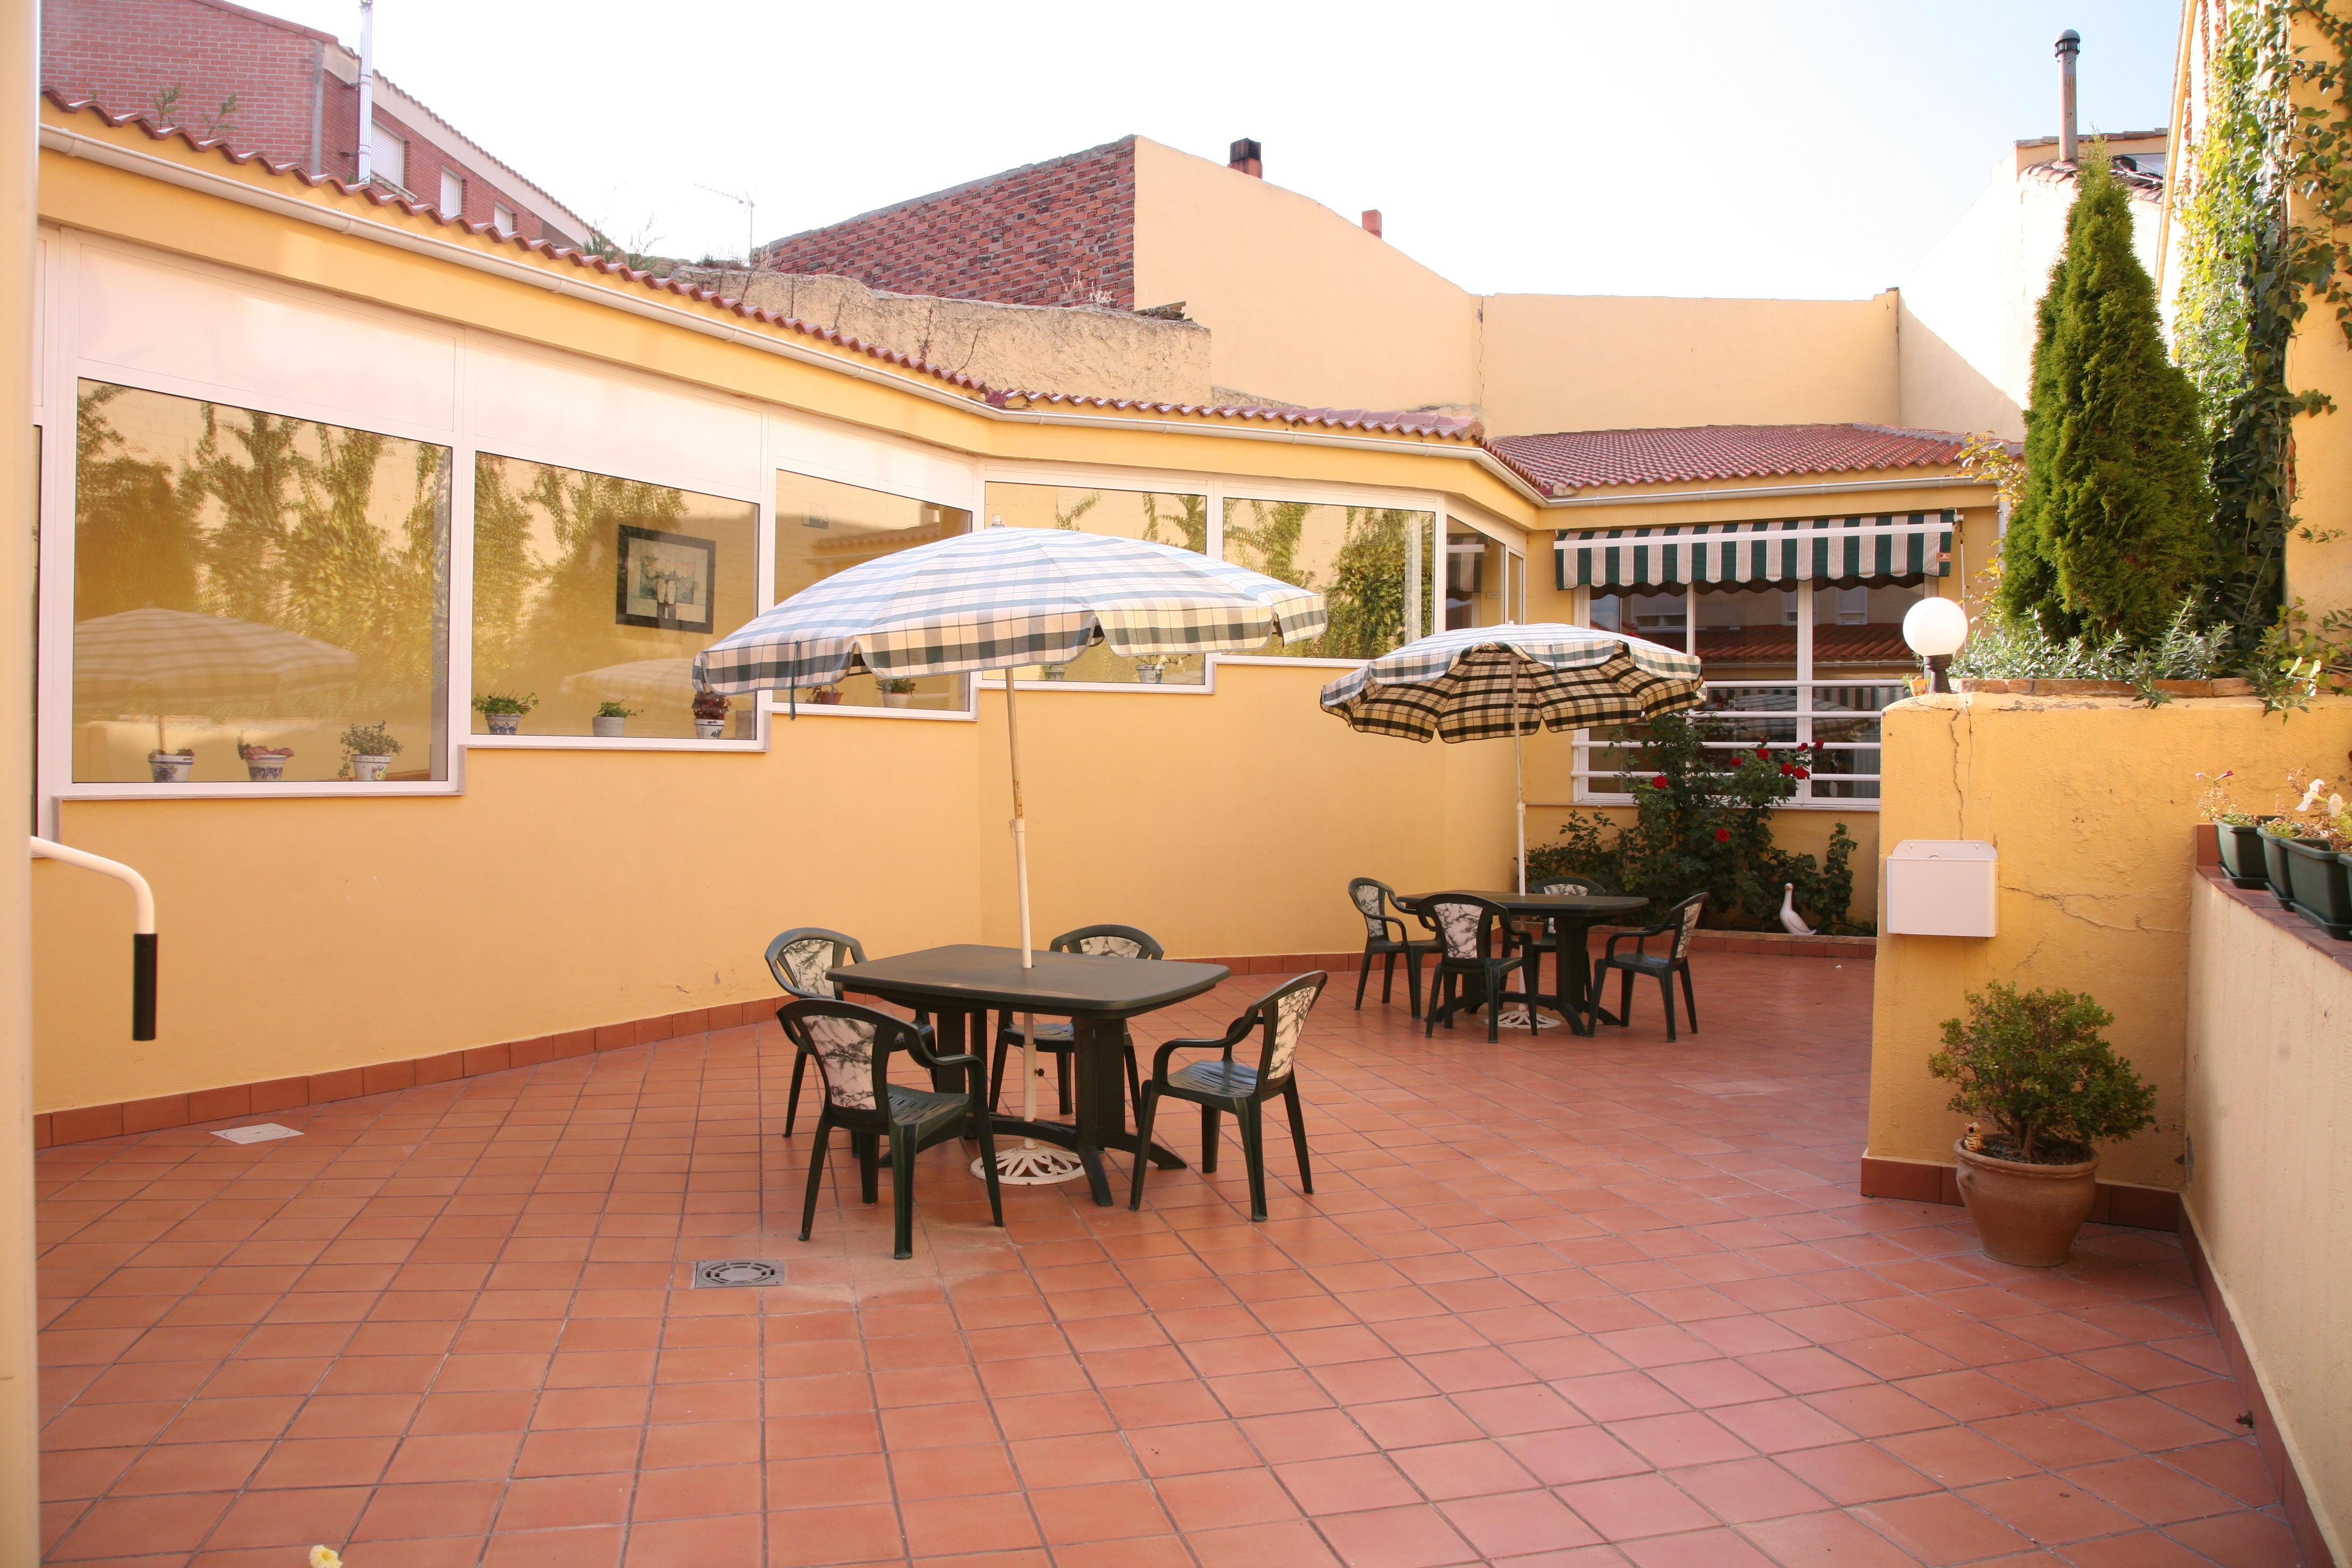 Residencia Santa Ana